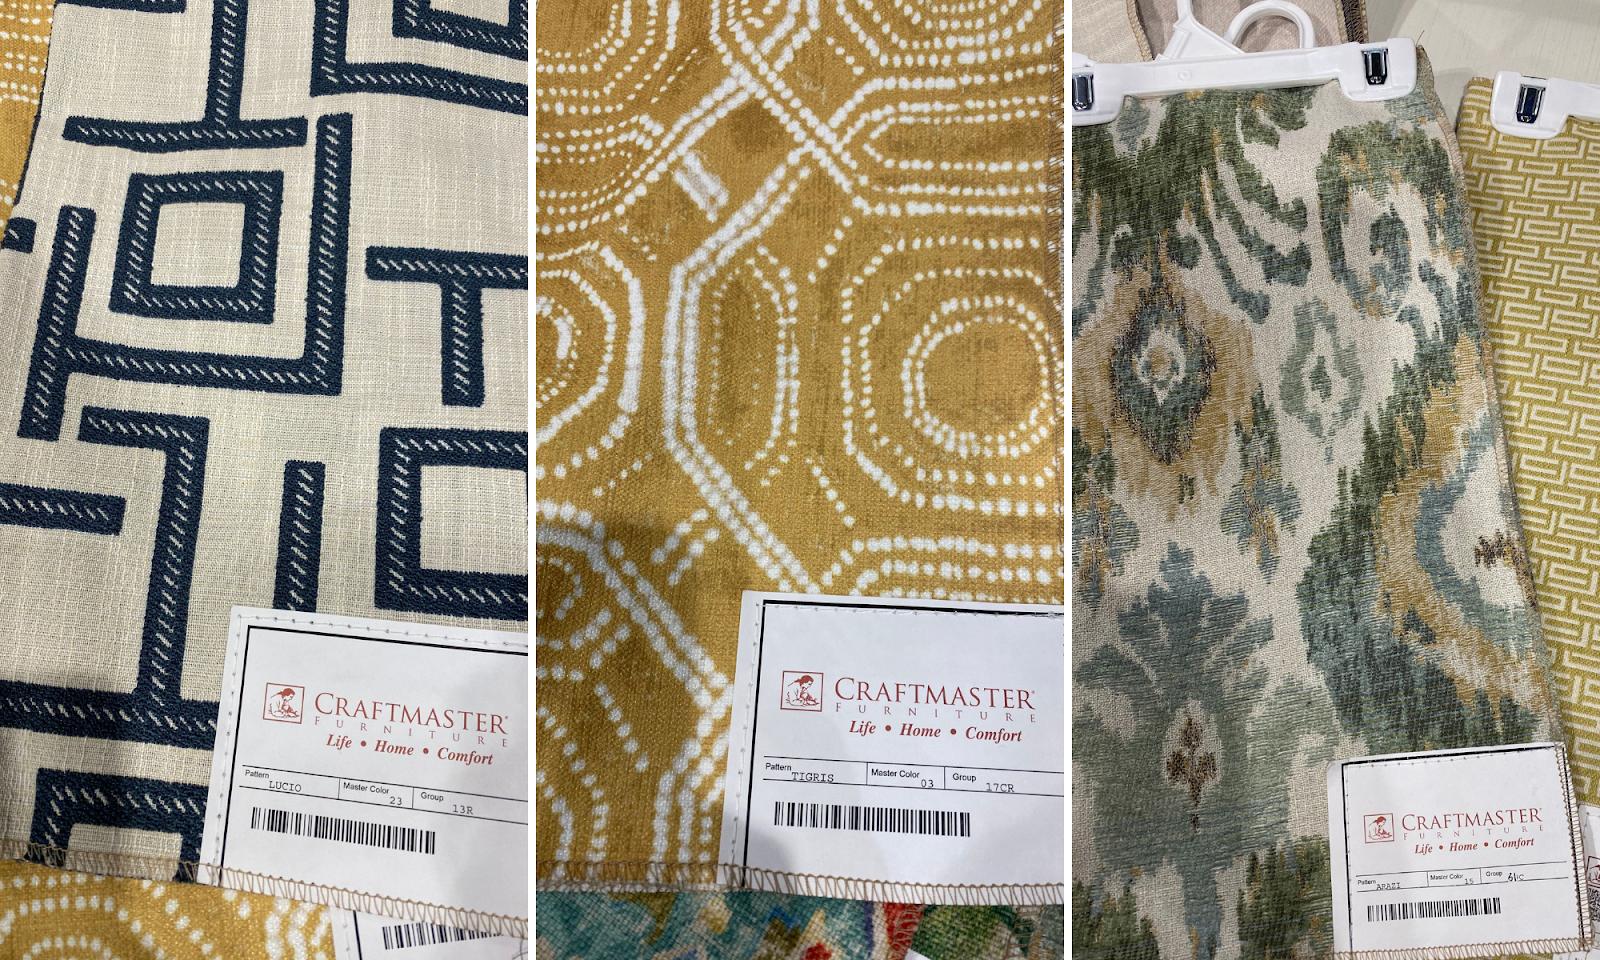 superior-construction-lebanon-tn-select-durable-fabrics-performance-fabrics-from-revolution-crypton-insideout